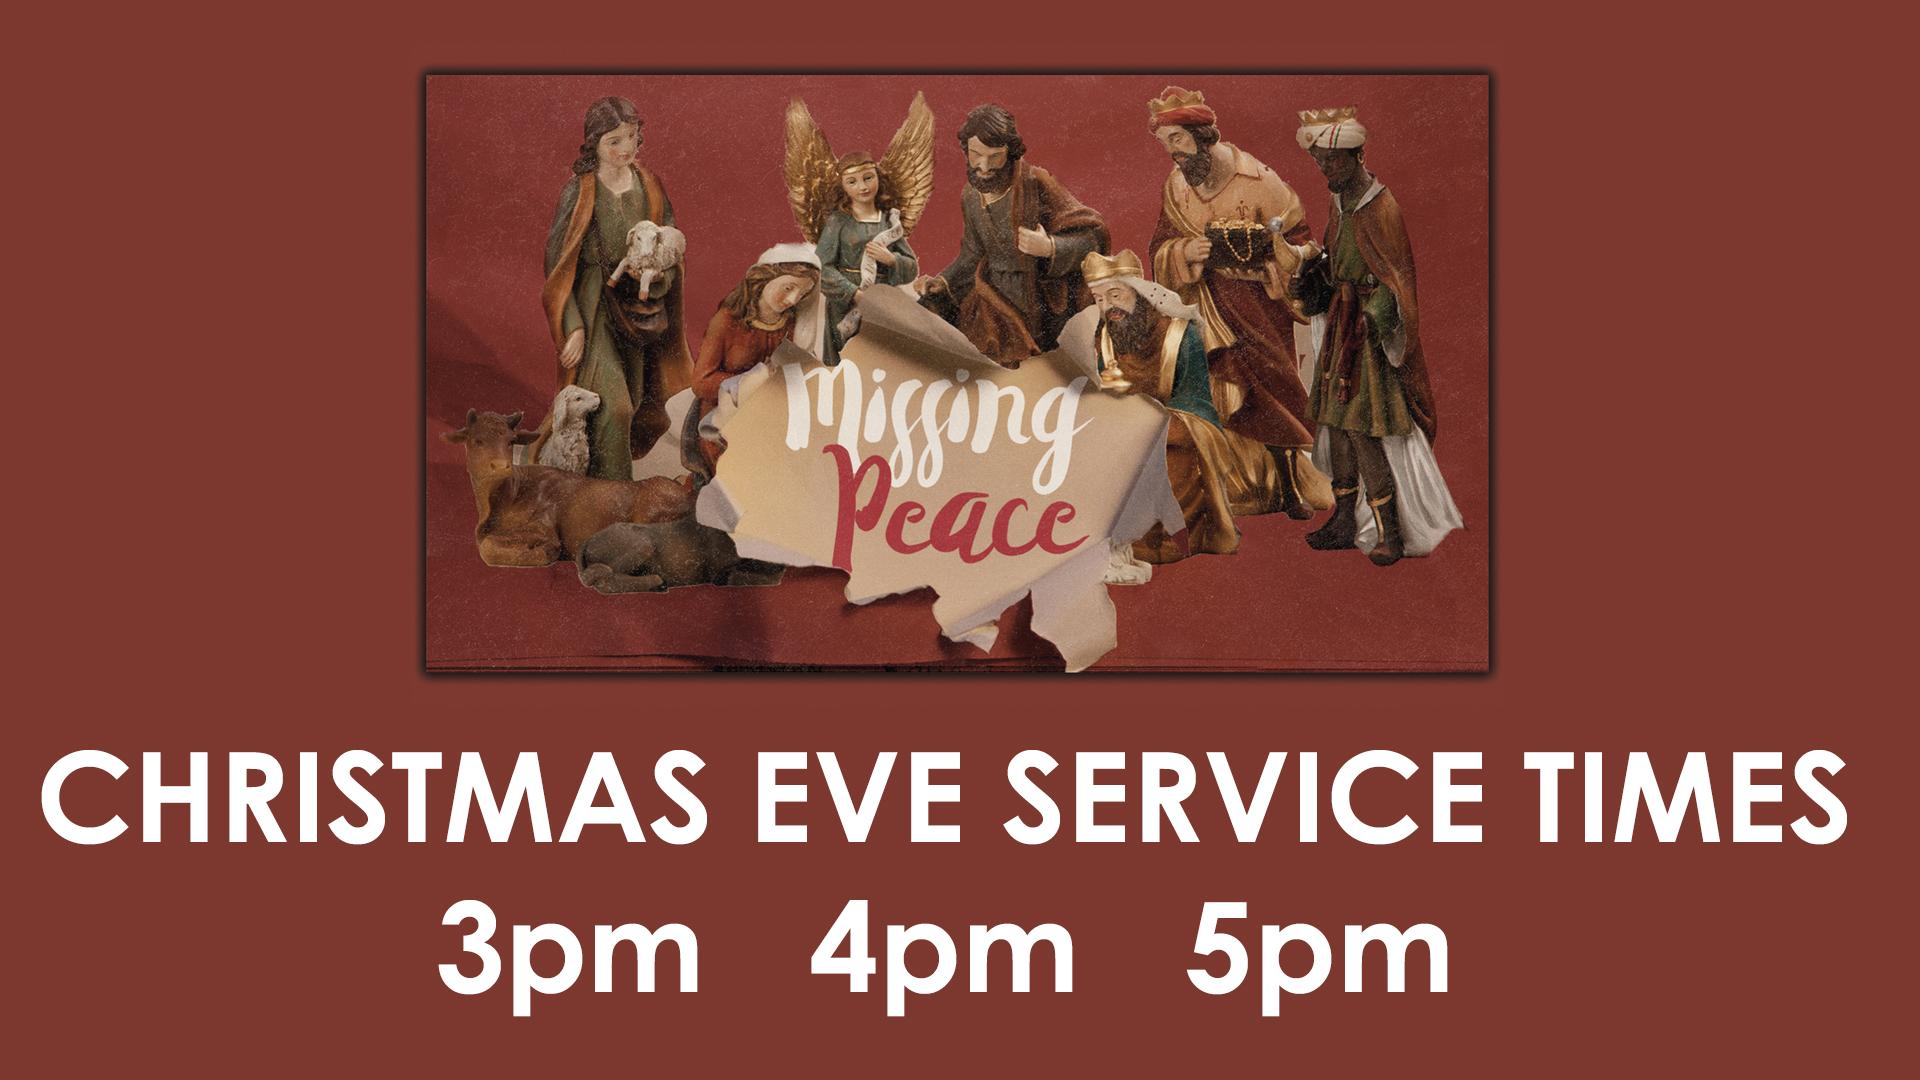 Missing Peace Christmas Eve.jpg